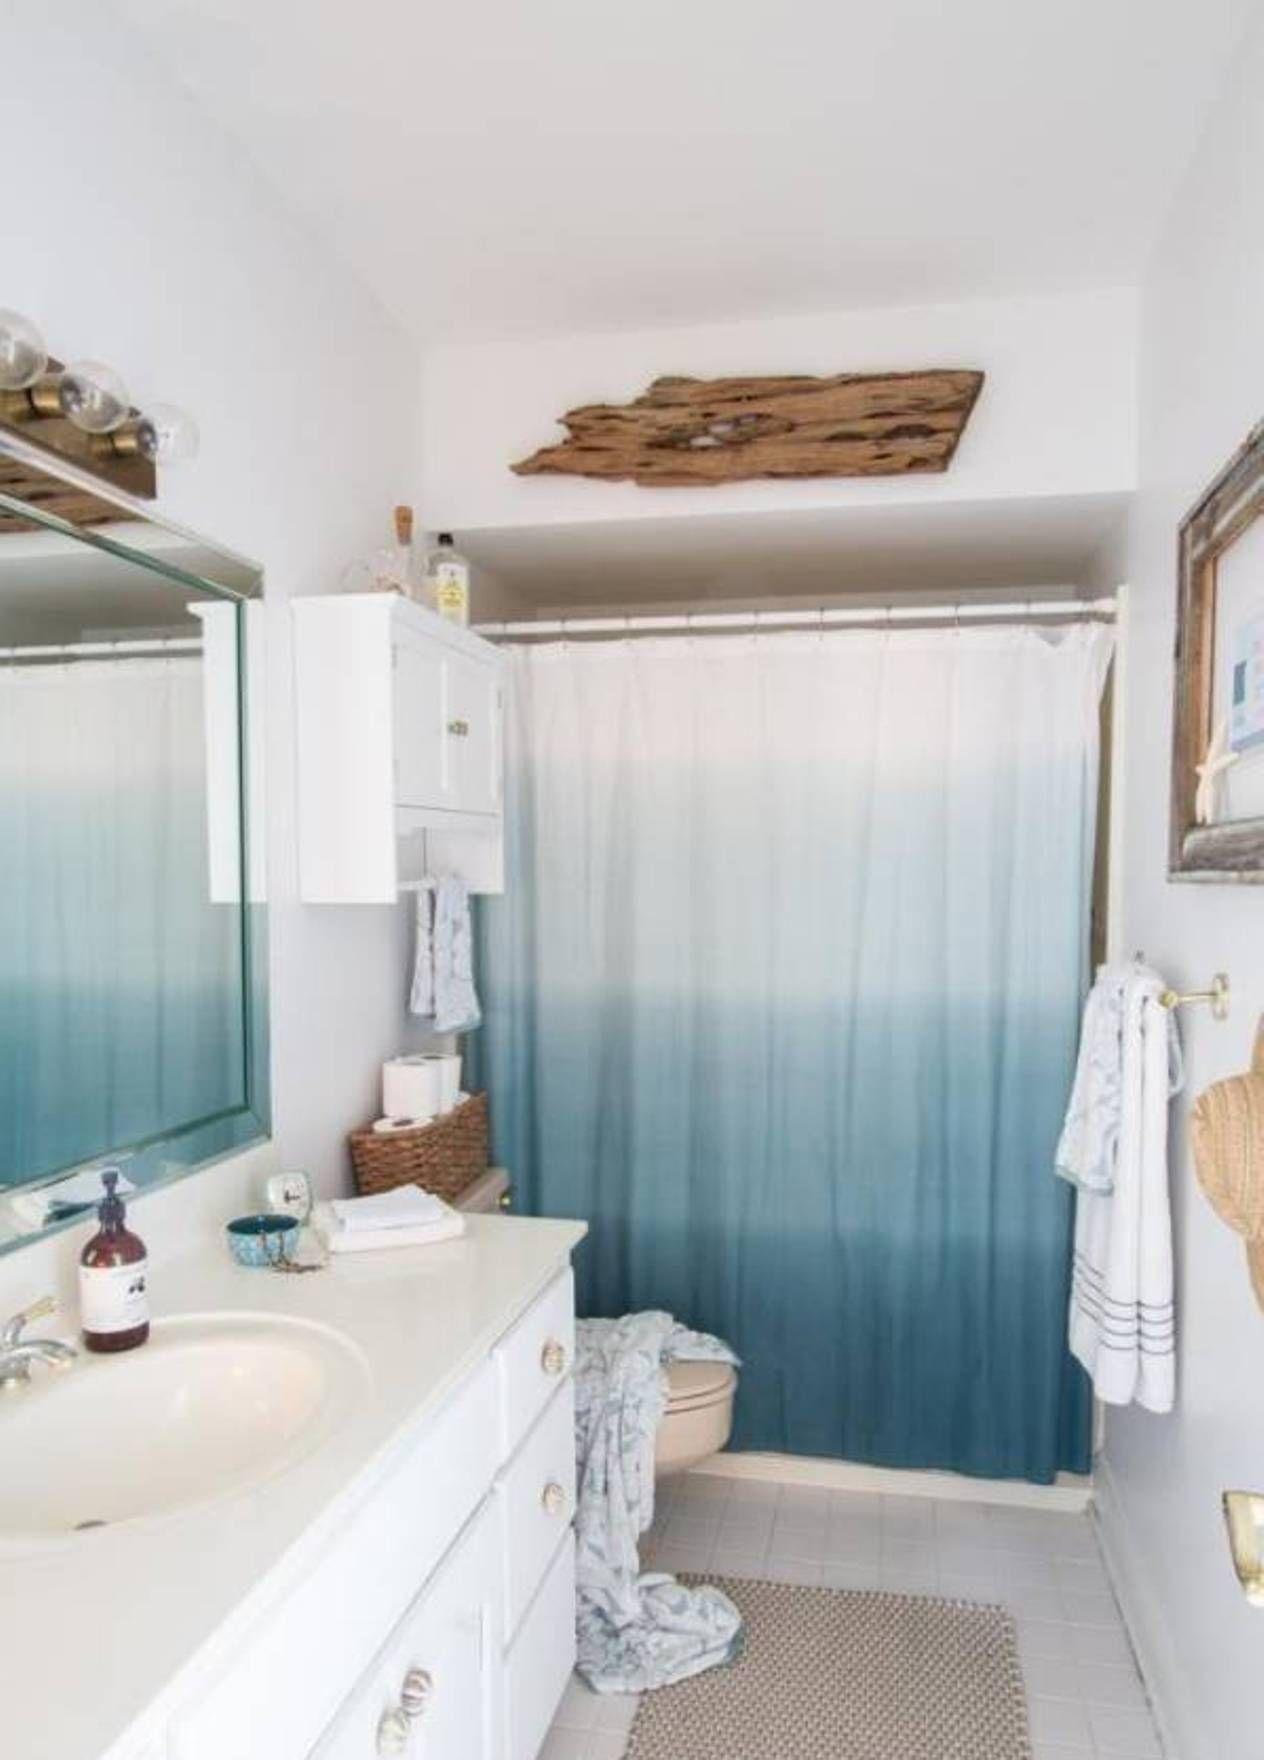 5 x 4 badezimmerdesigns interior design  ombre bathroom  pinterest  bathroom designs